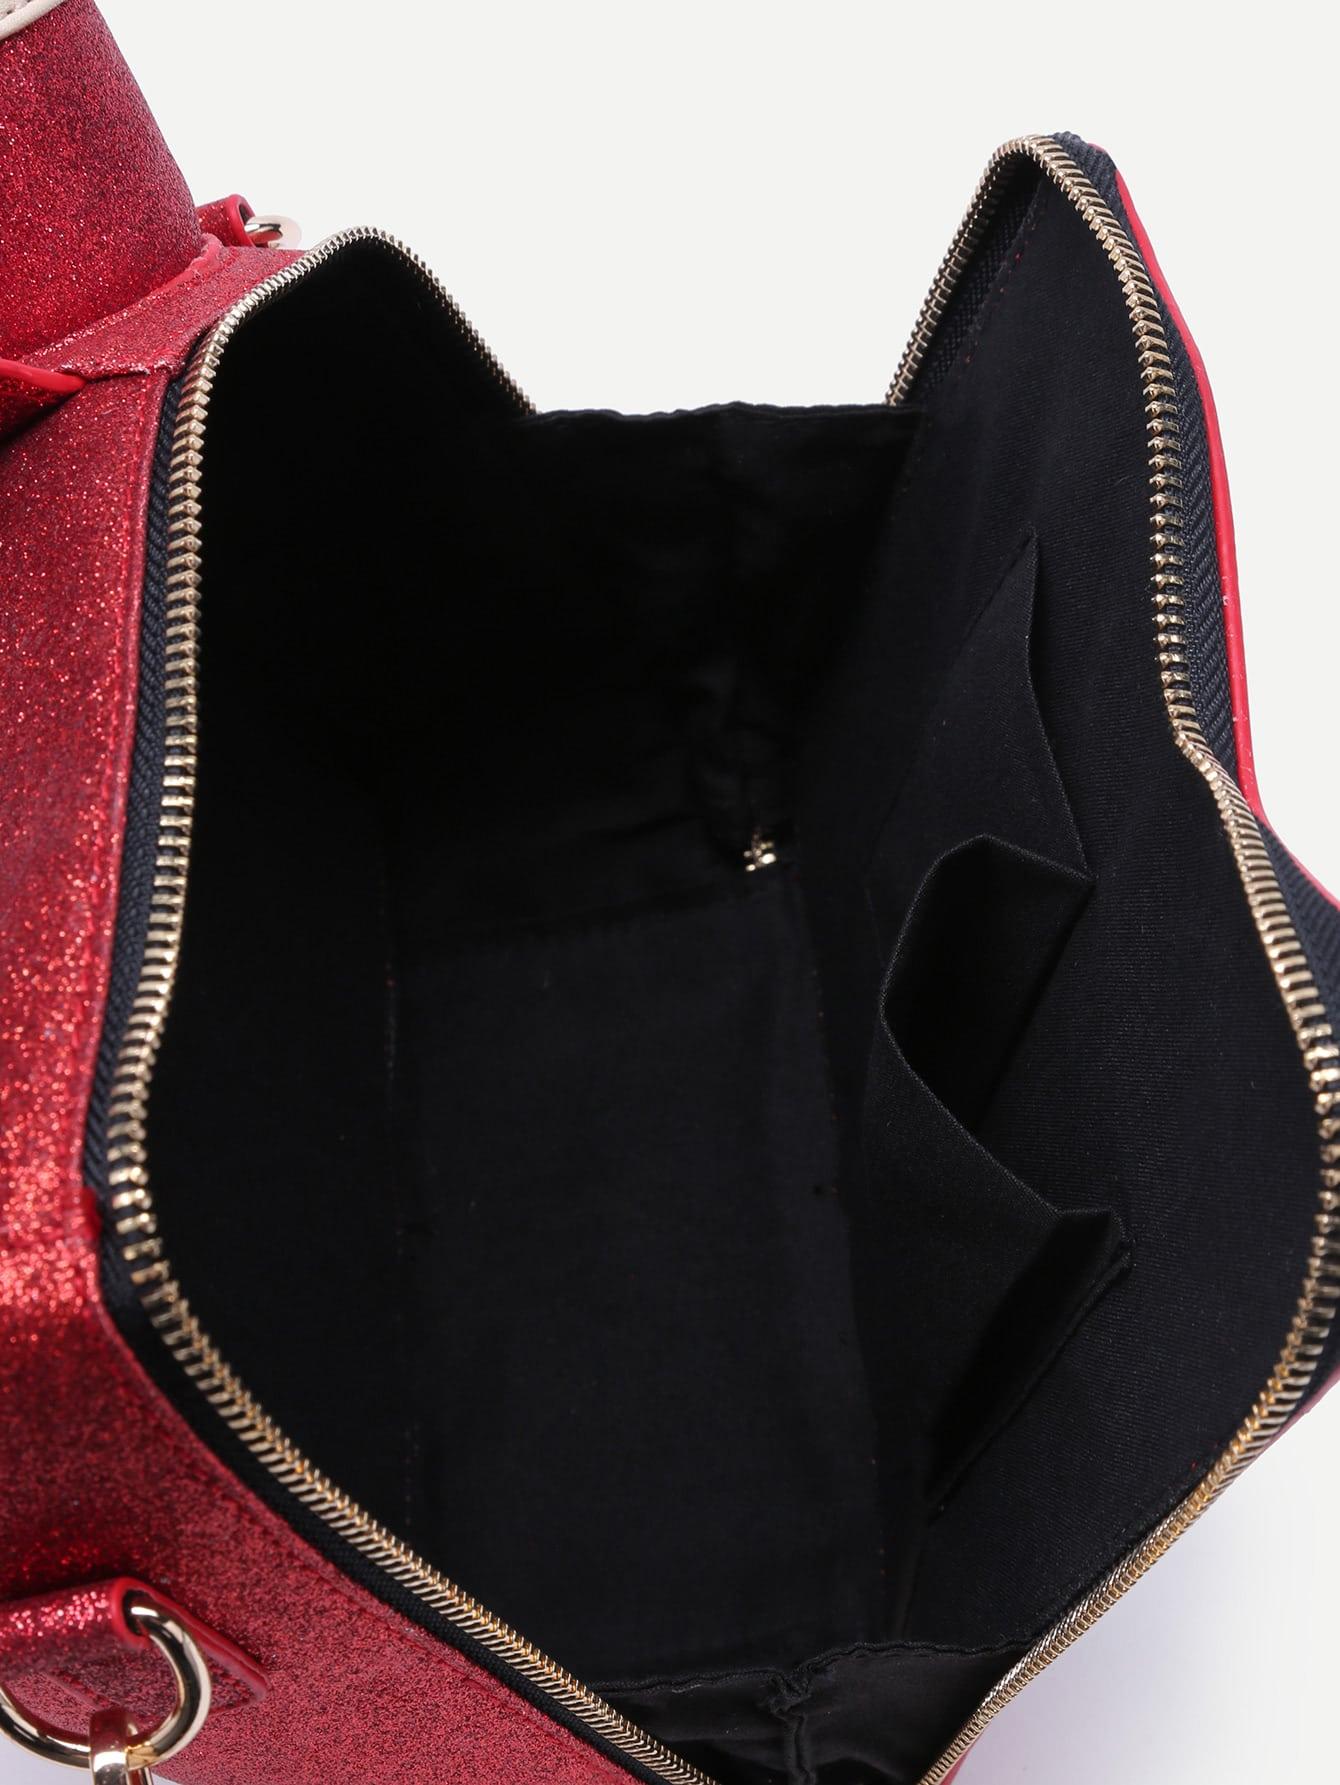 bag161107908_2